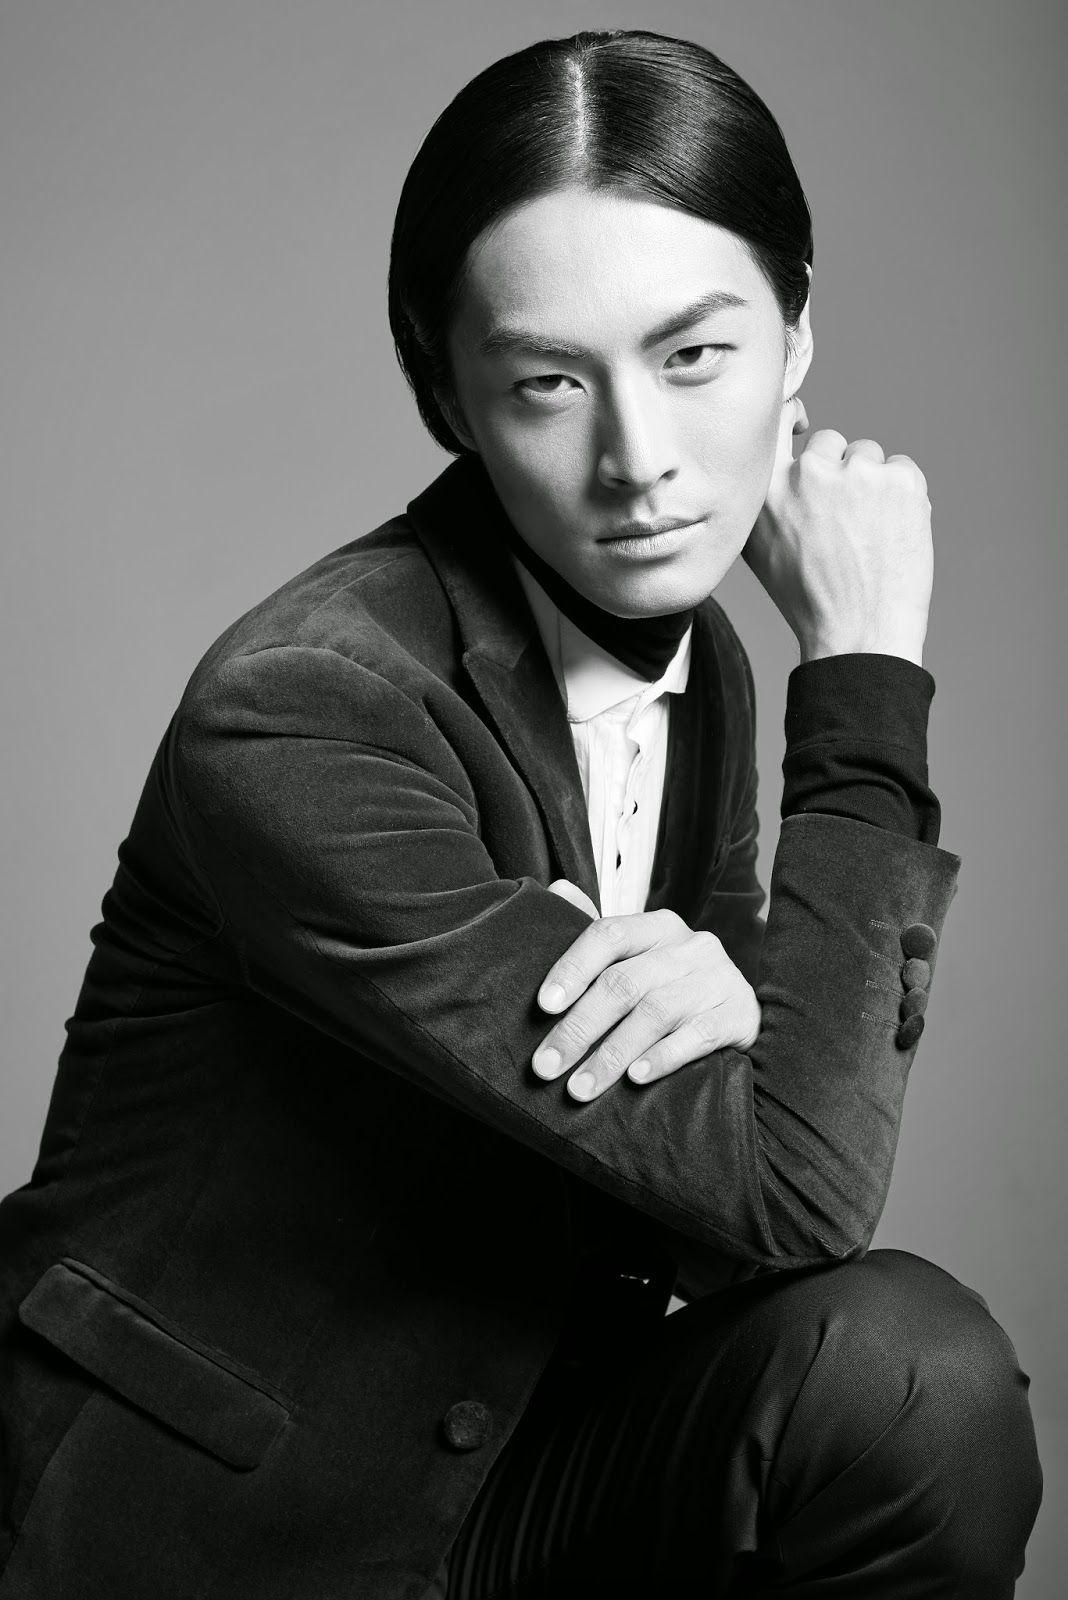 Major New York model David Chiang - Google Search